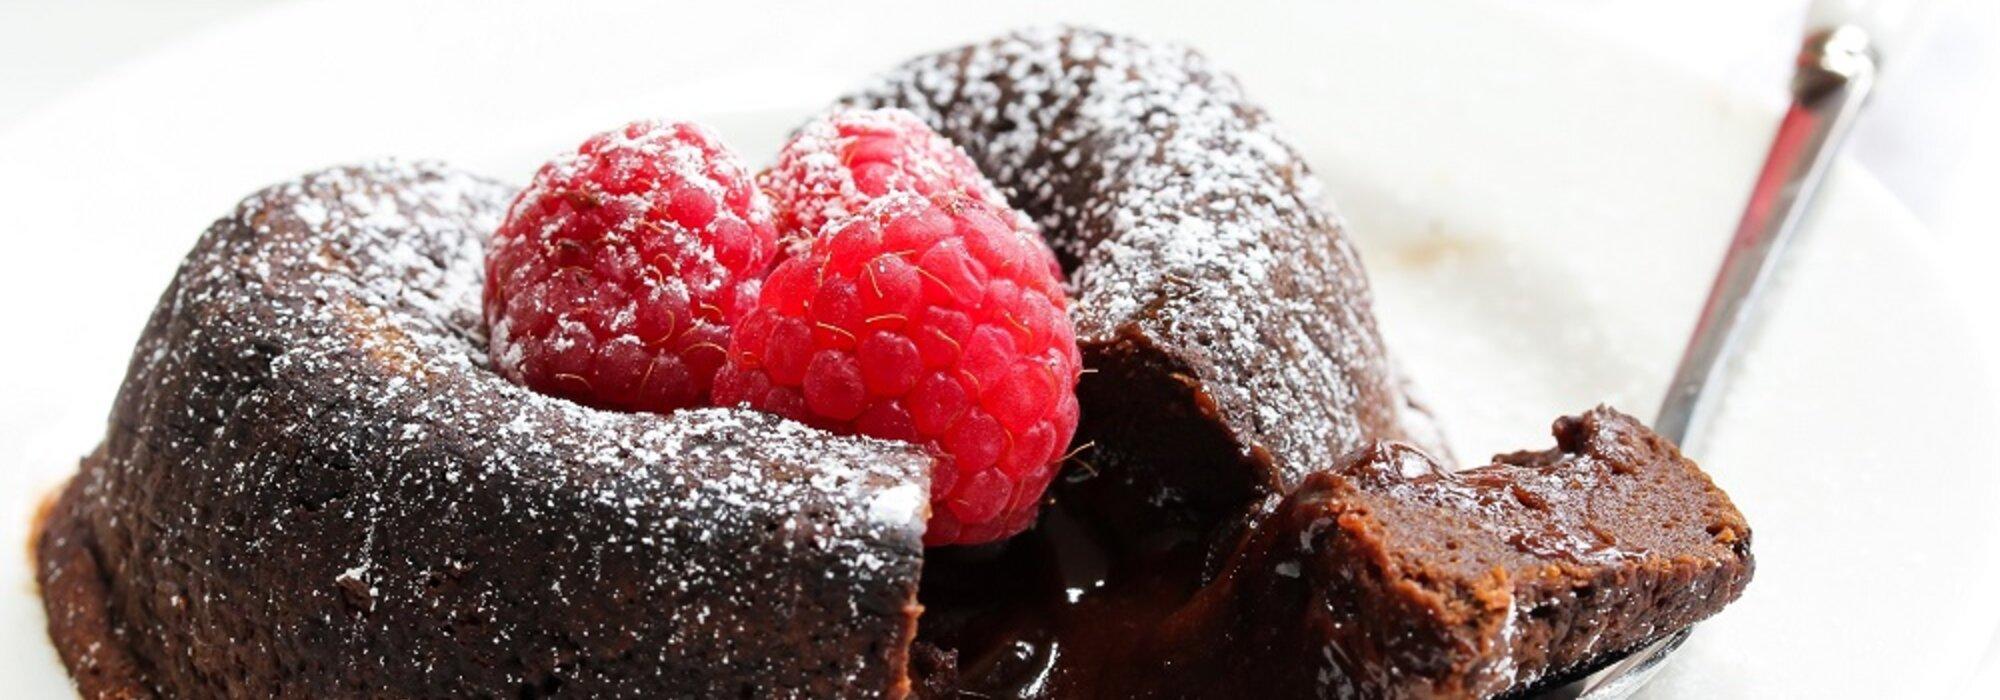 Koolhydraatarme en suikervrije Lava cake